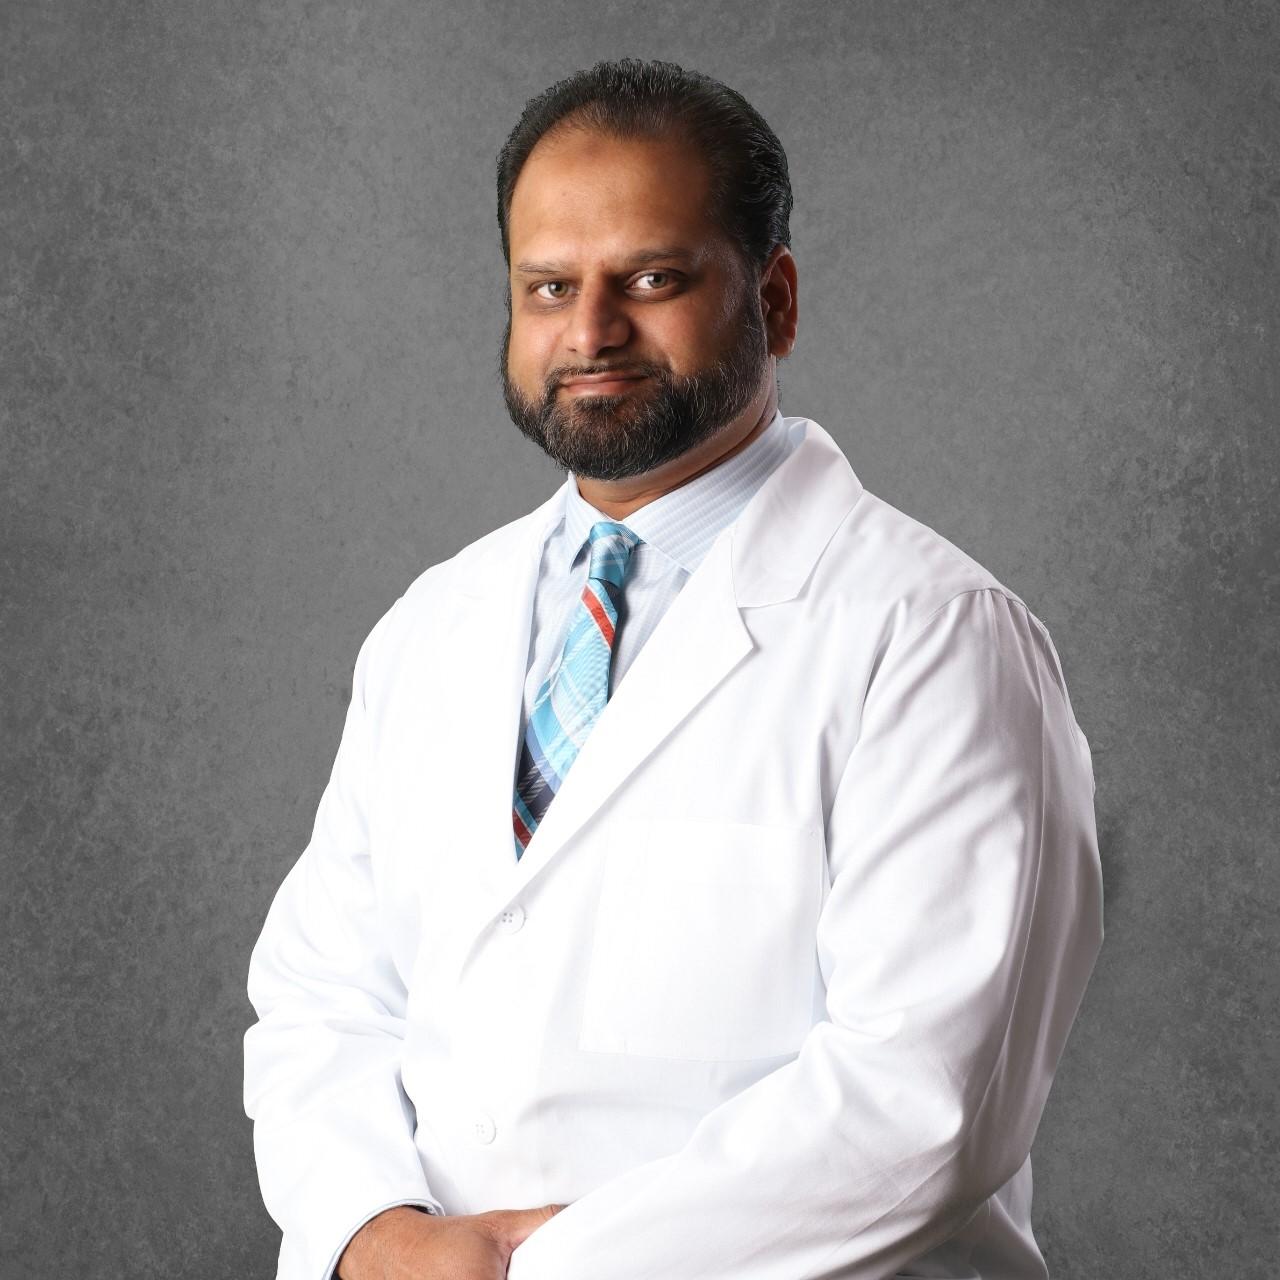 Dr. Saeed - Shopko Optical optometrist